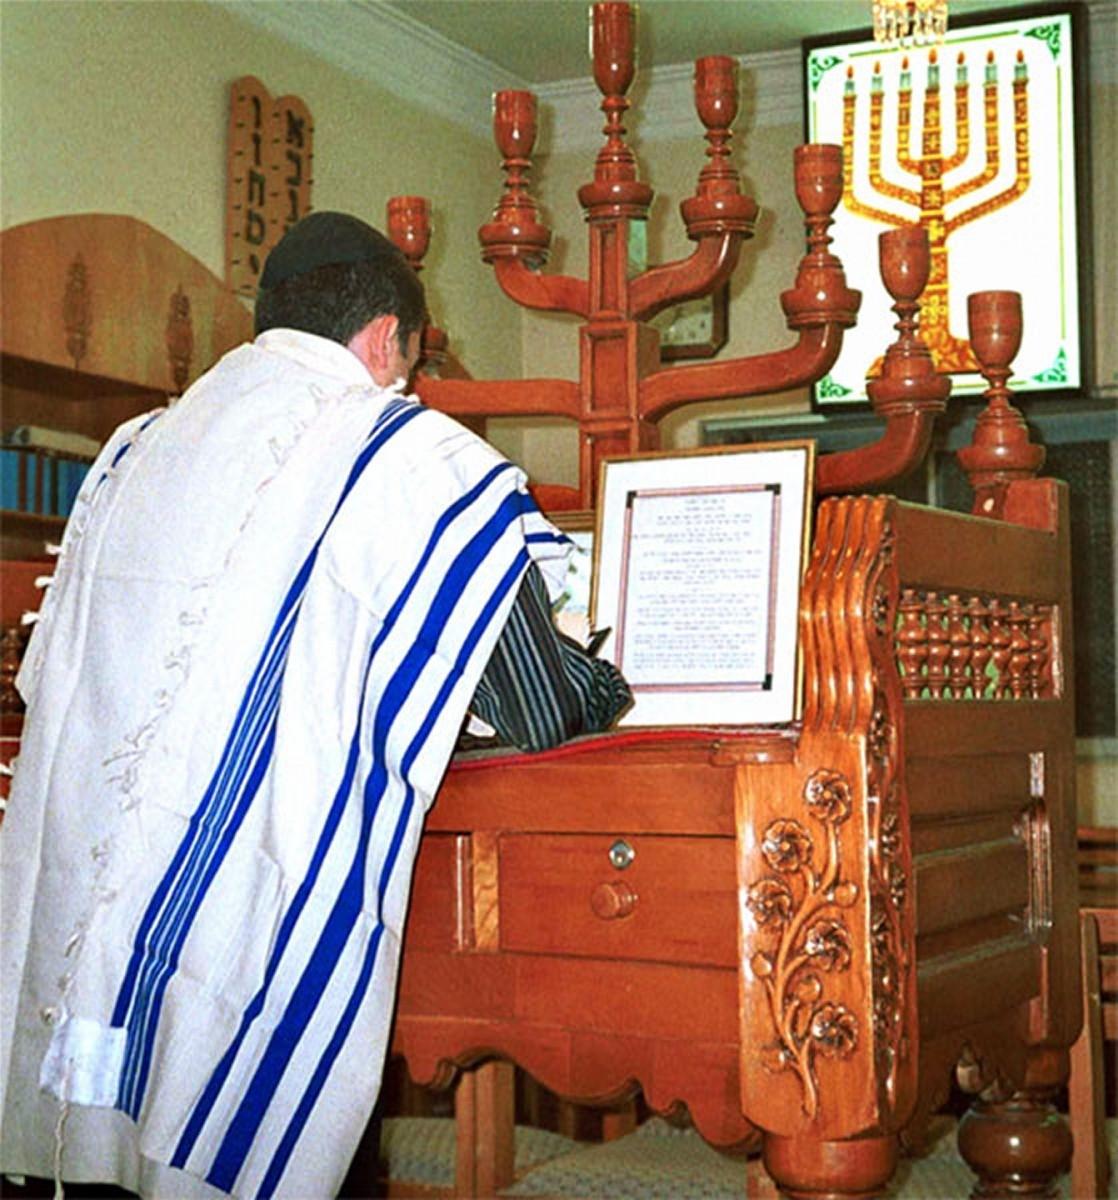 A man wearing a tallit, a traditional Jewish prayer shawl while worship.